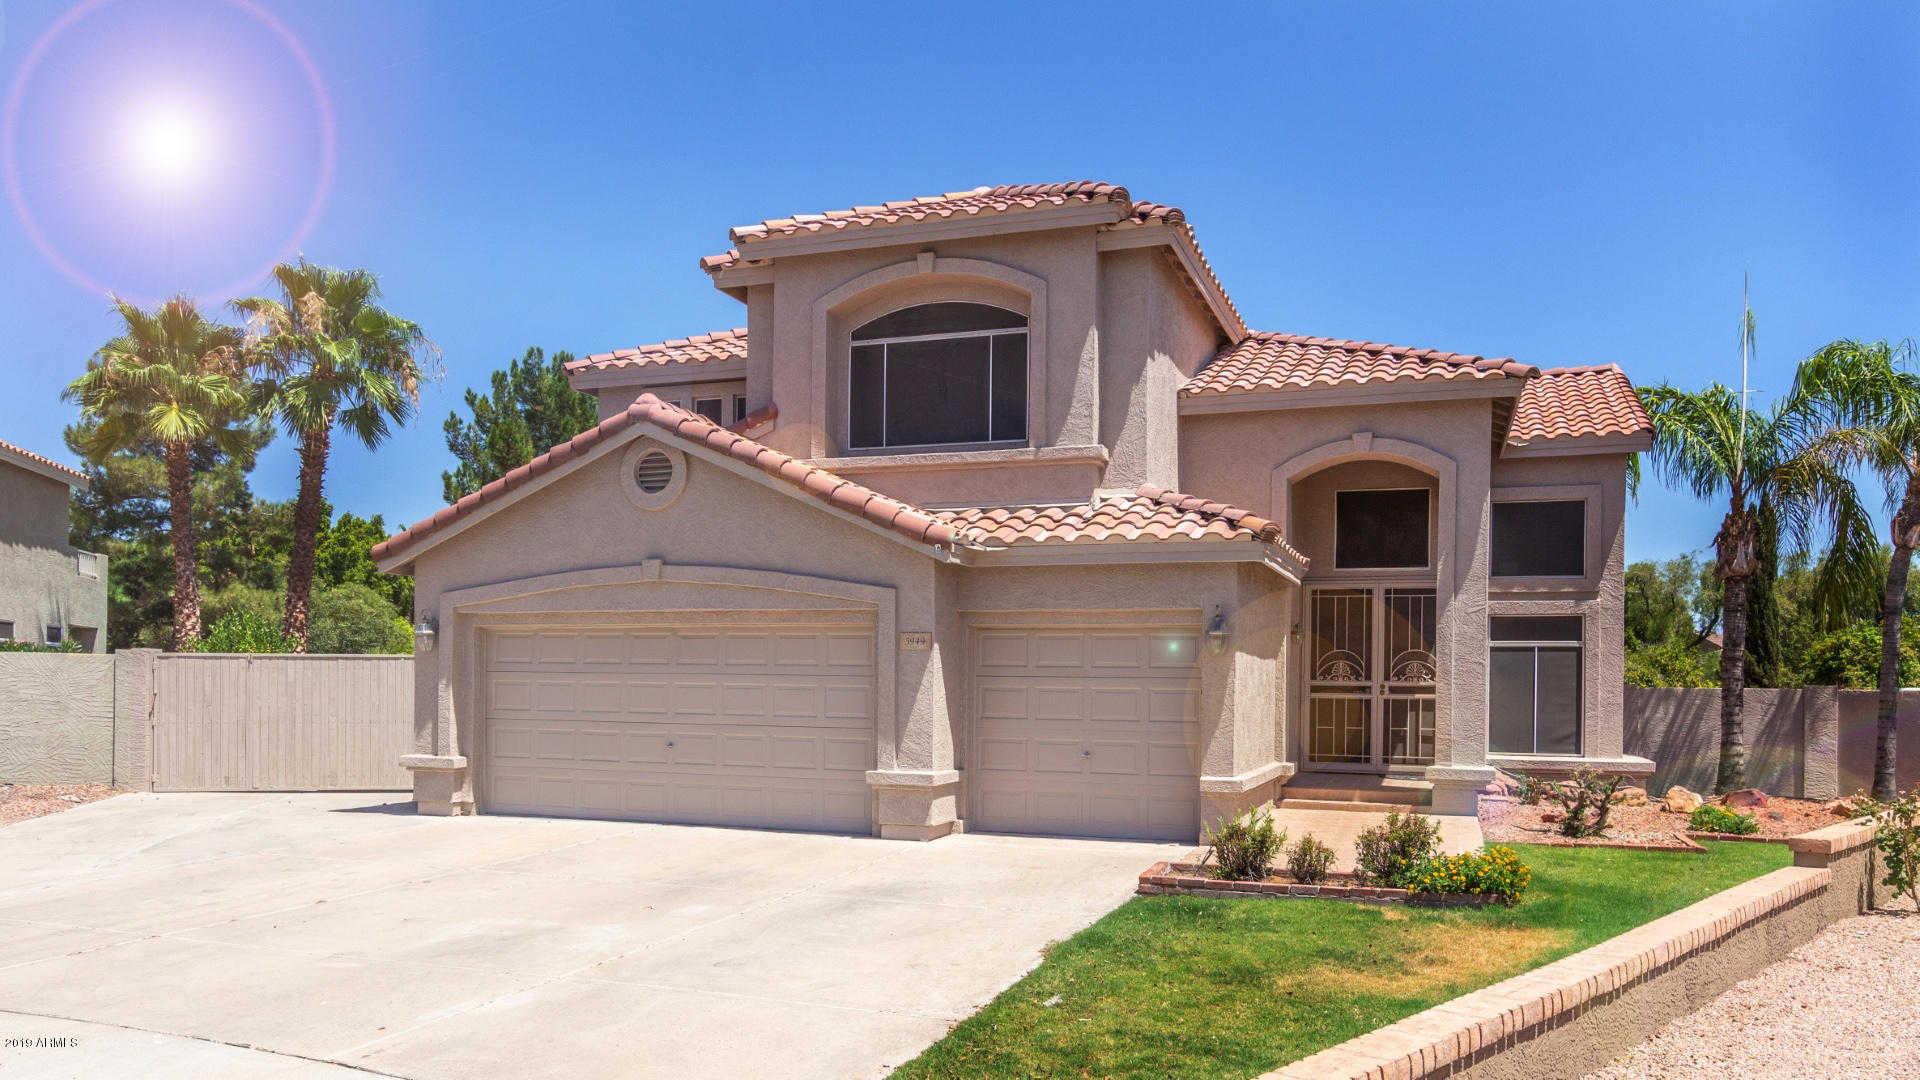 $394,000 - 5Br/3Ba - Home for Sale in Arrowhead Ranch Parcels 3 & 4, Glendale